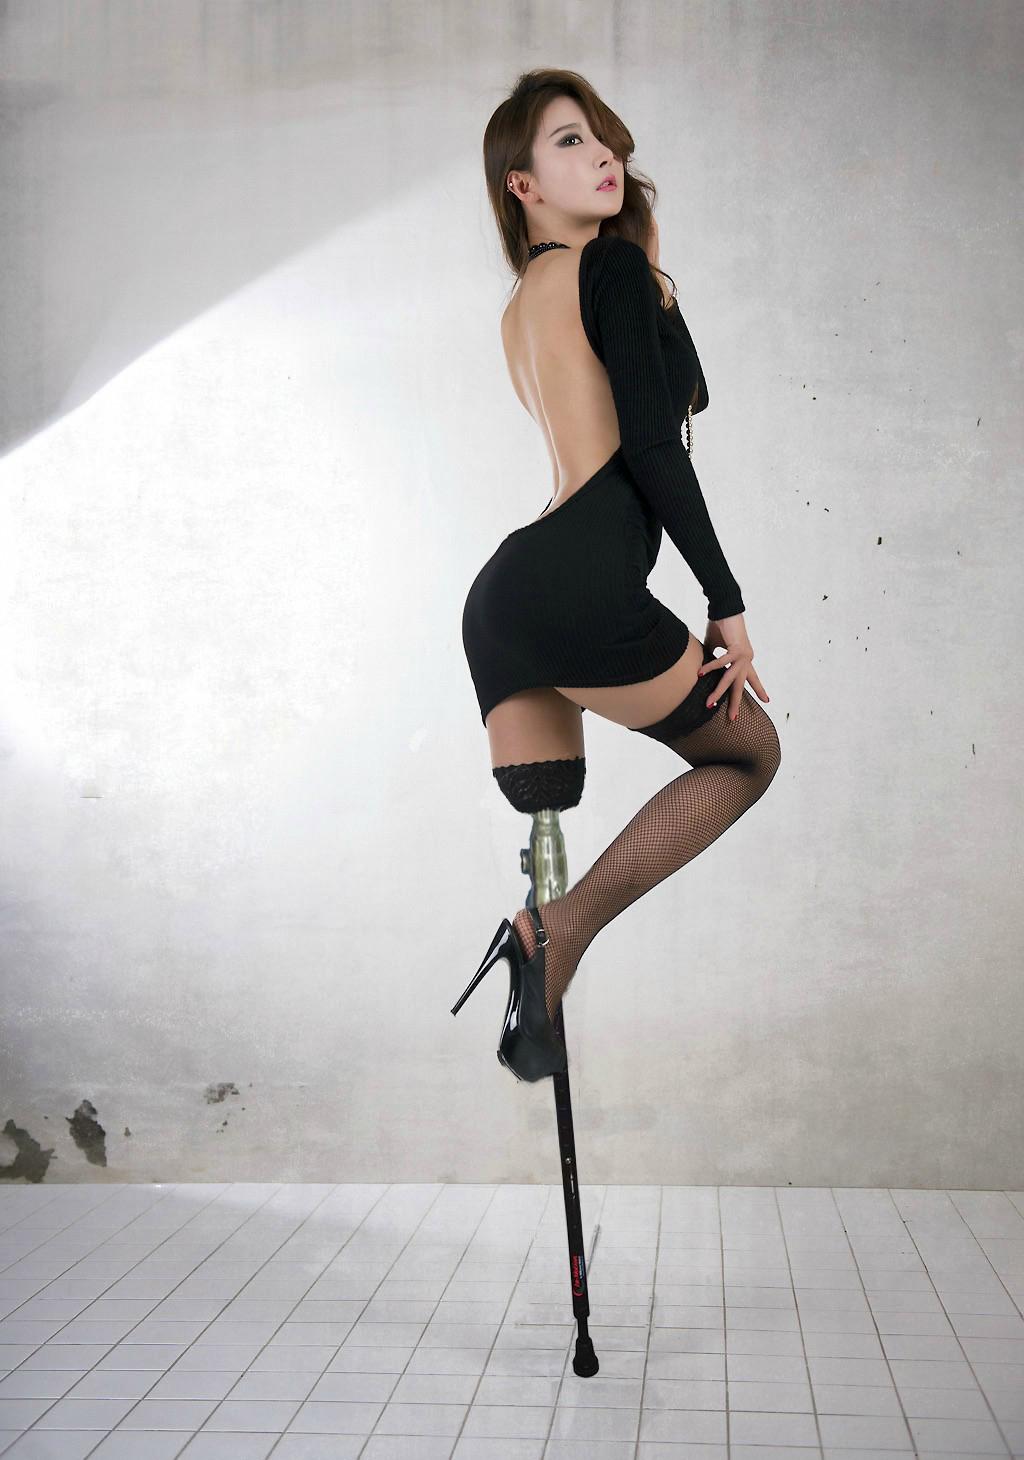 Sexy amputee girl